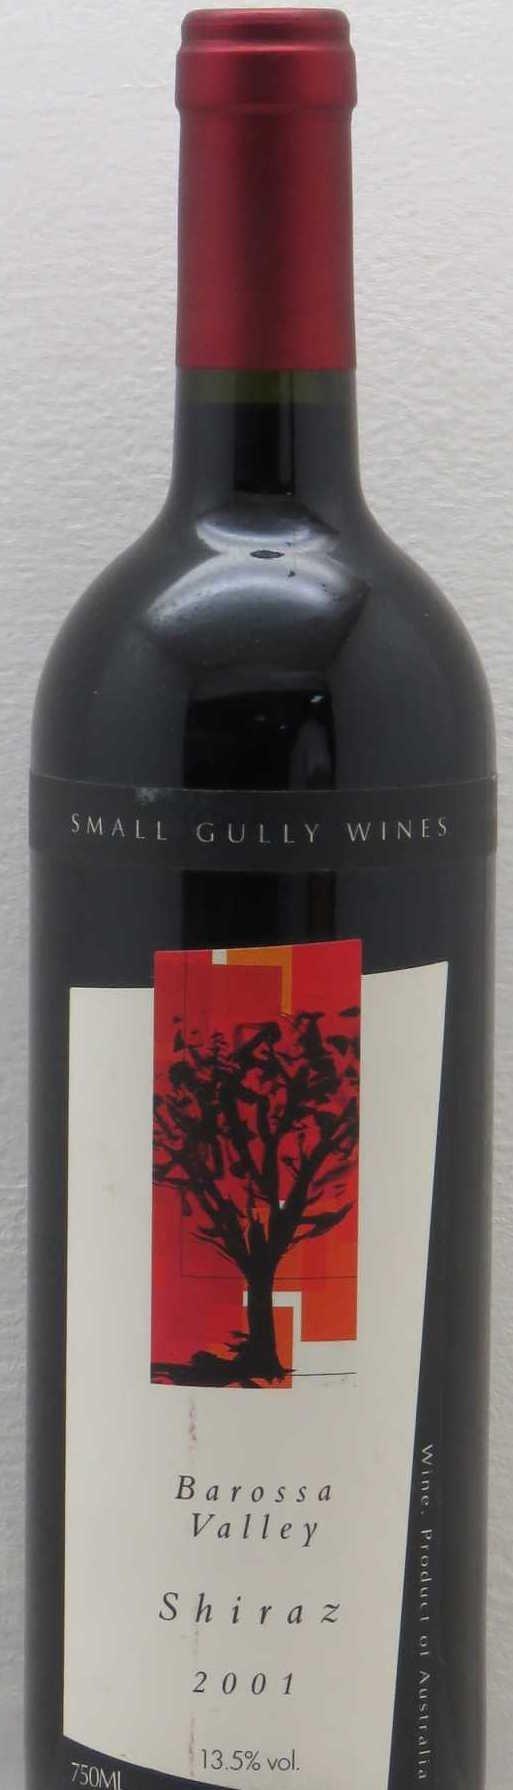 Small Gully Shiraz 2001-0